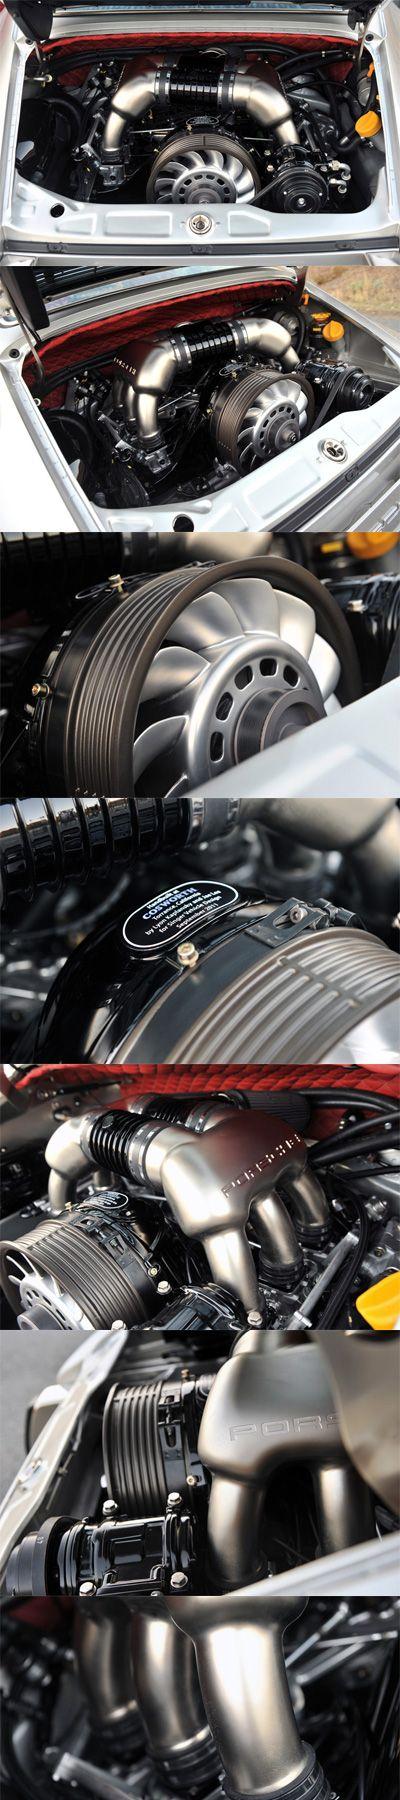 Singer Porsche engine. Yes, it's Air Cooled